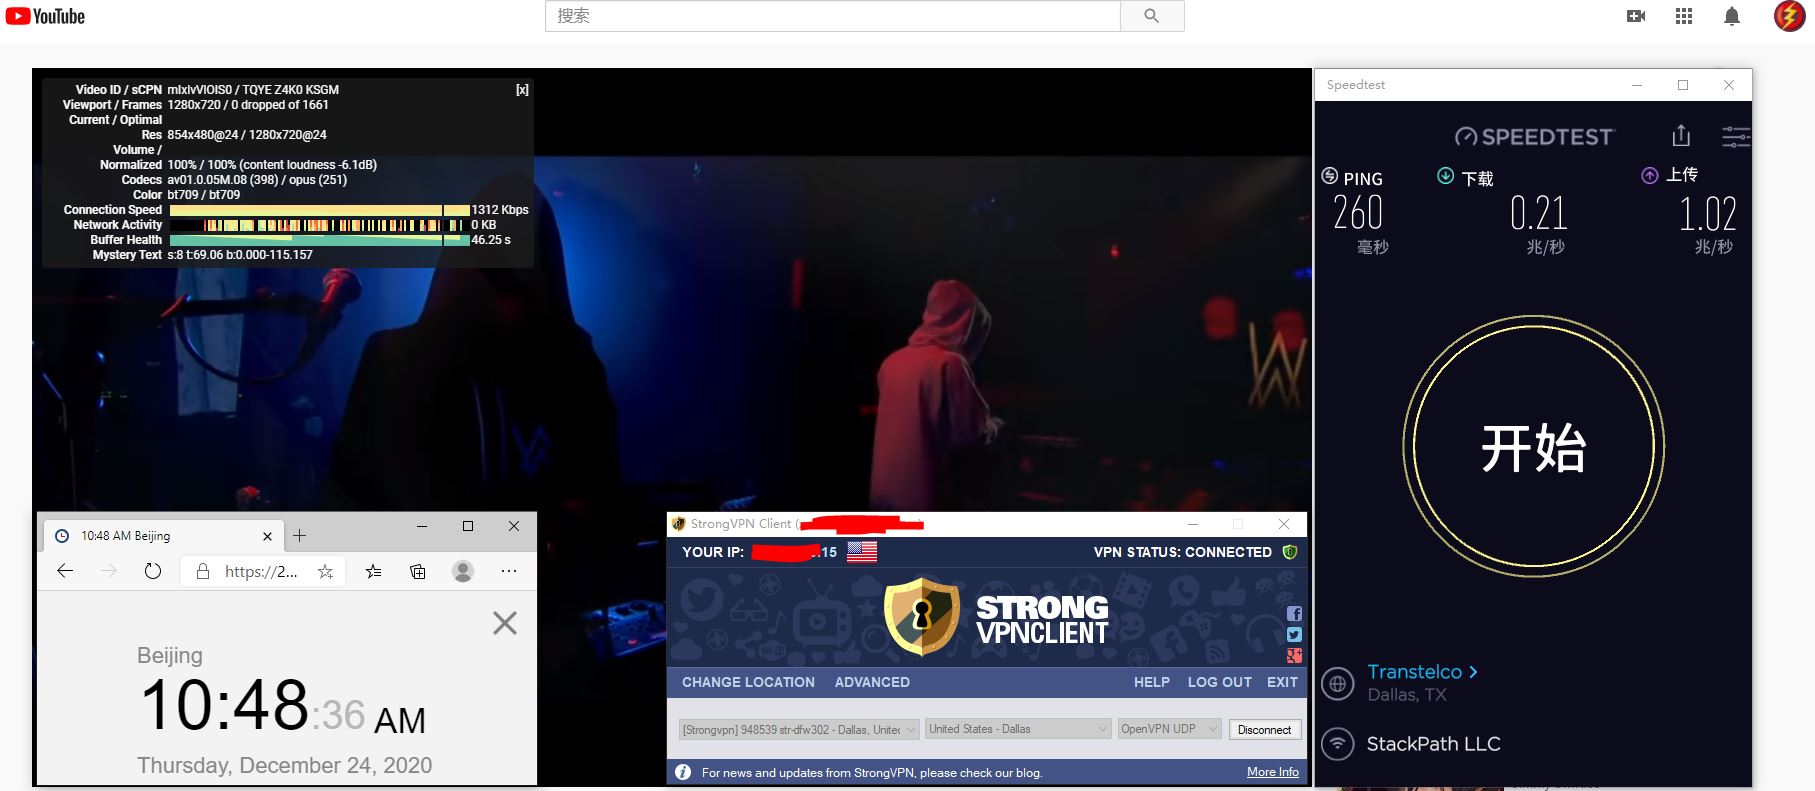 Windows10 StrongVPN USA - Dallas-2 服务器 中国VPN 翻墙 科学上网 测试 - 20201224Windows10 StrongVPN USA - Dallas-2 服务器 中国VPN 翻墙 科学上网 测试 - 20201224